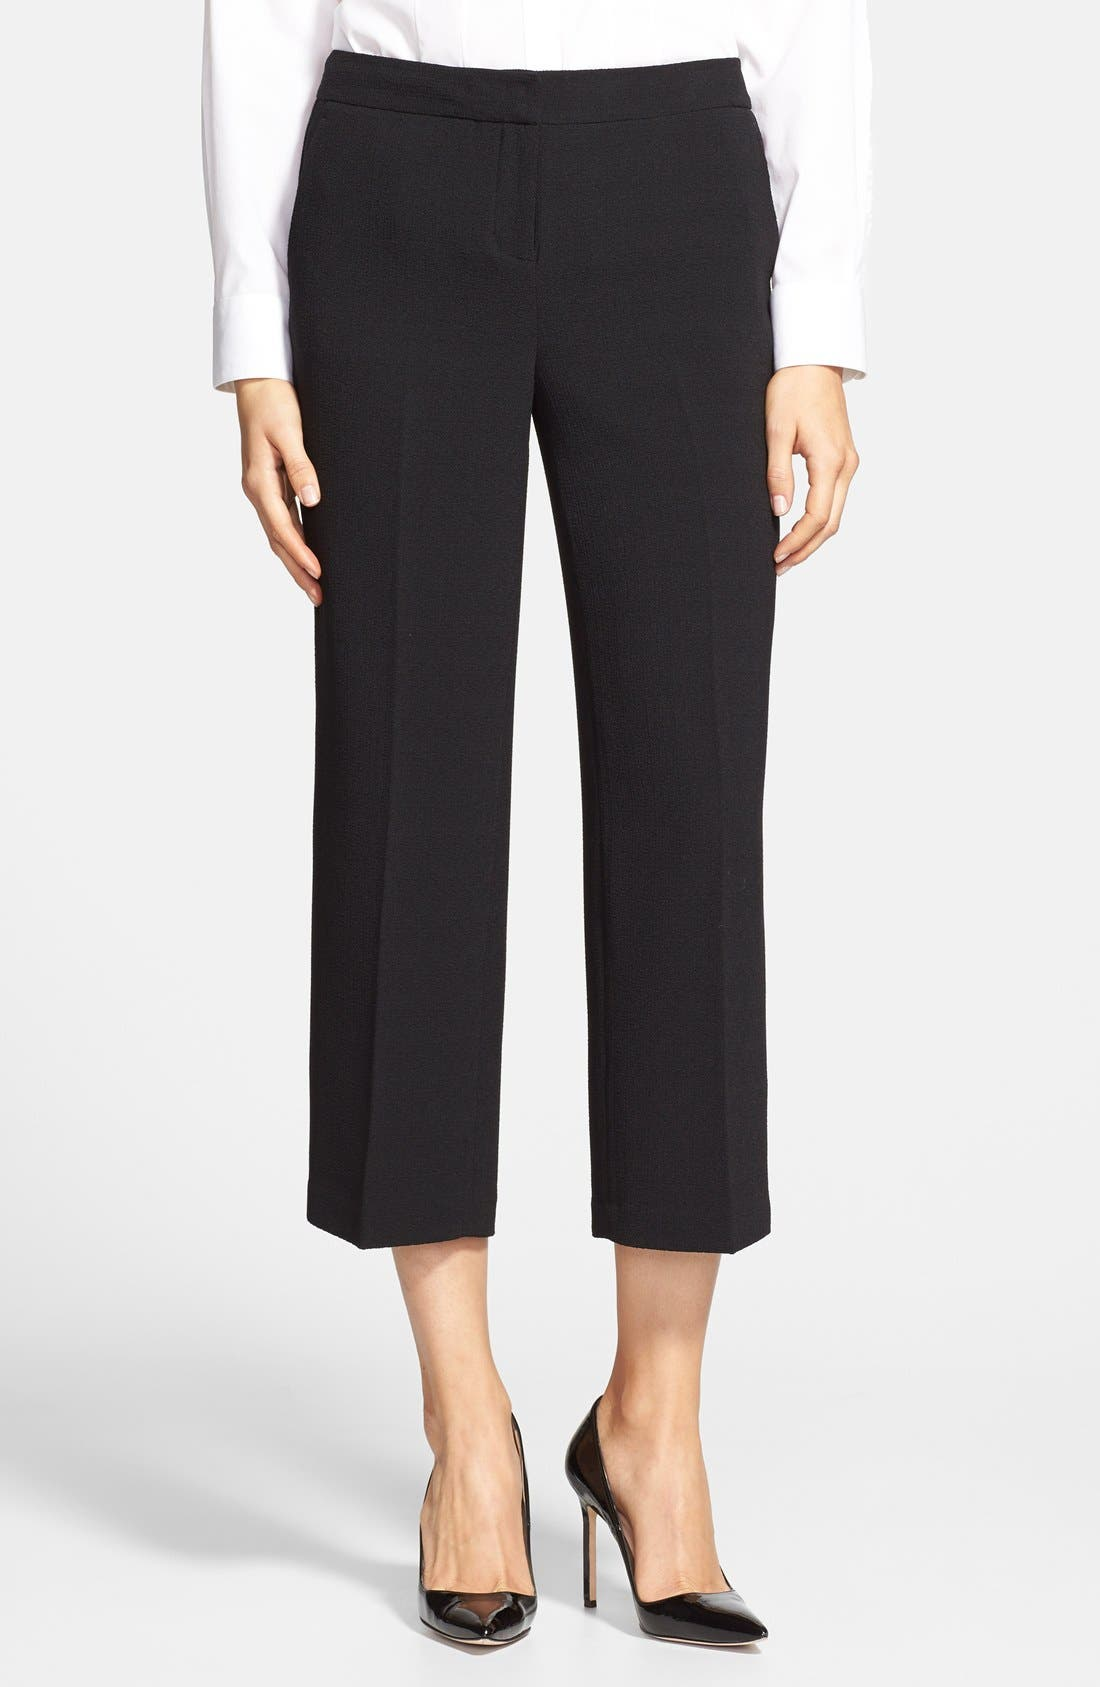 Alternate Image 1 Selected - Vince Camuto Crop Pants